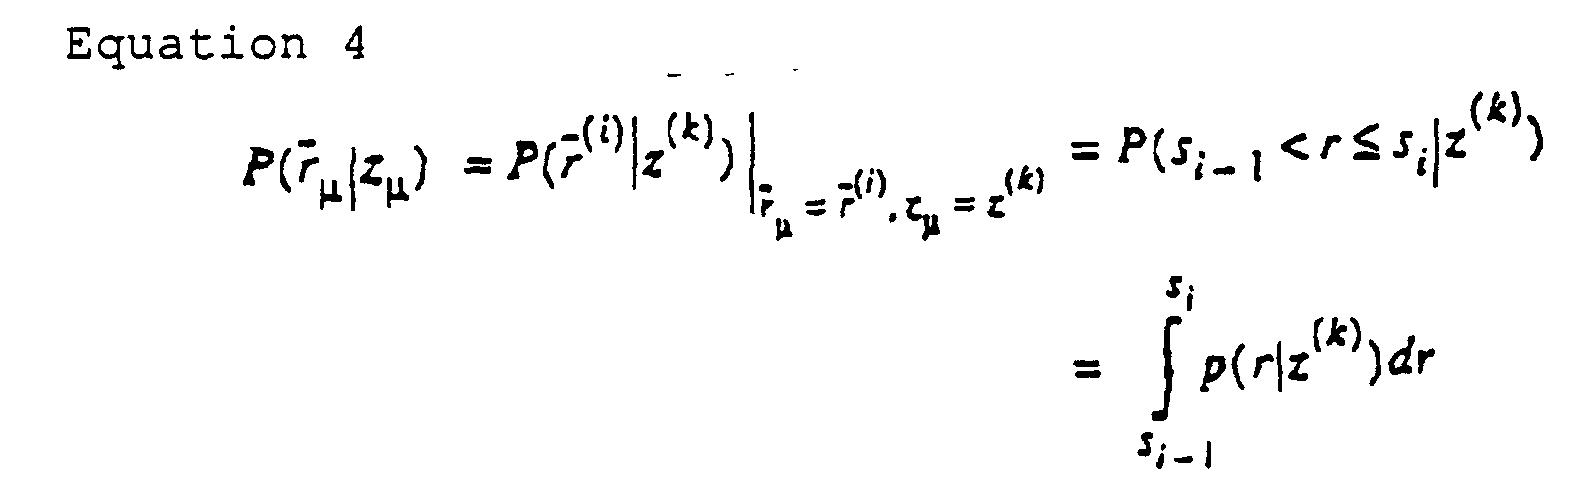 Figure 00120007